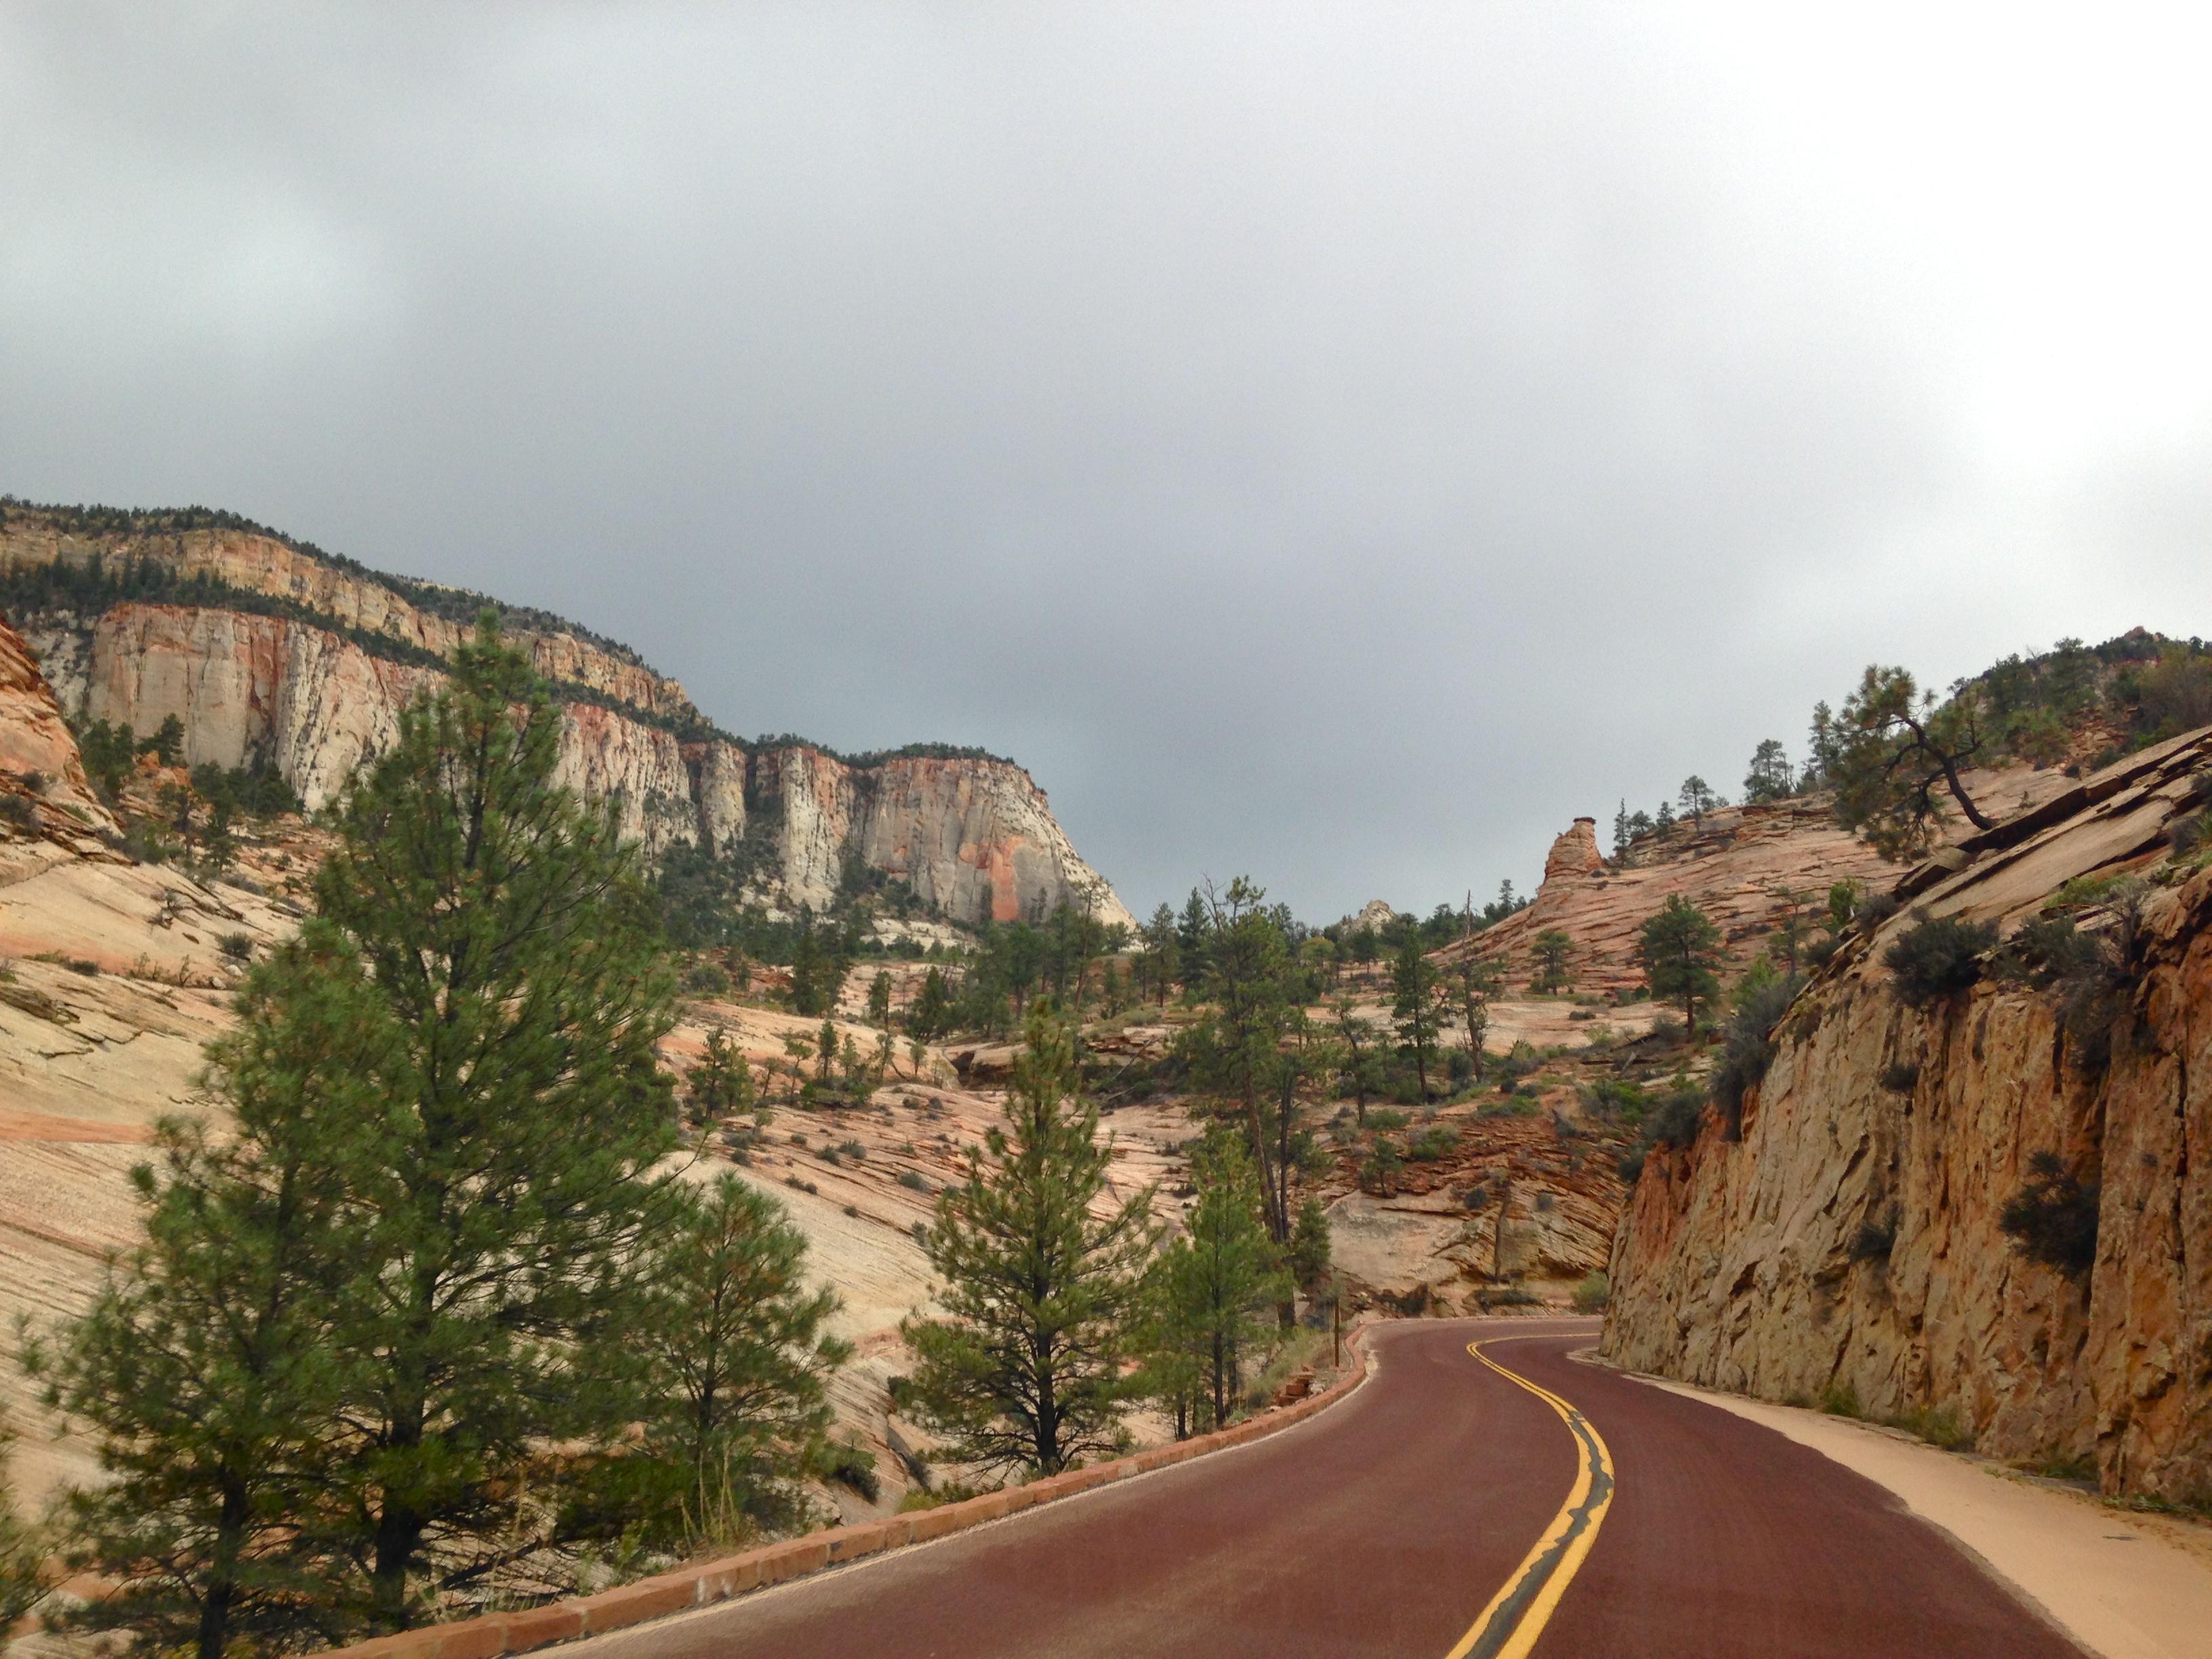 Visiting Zion National Park in Utah